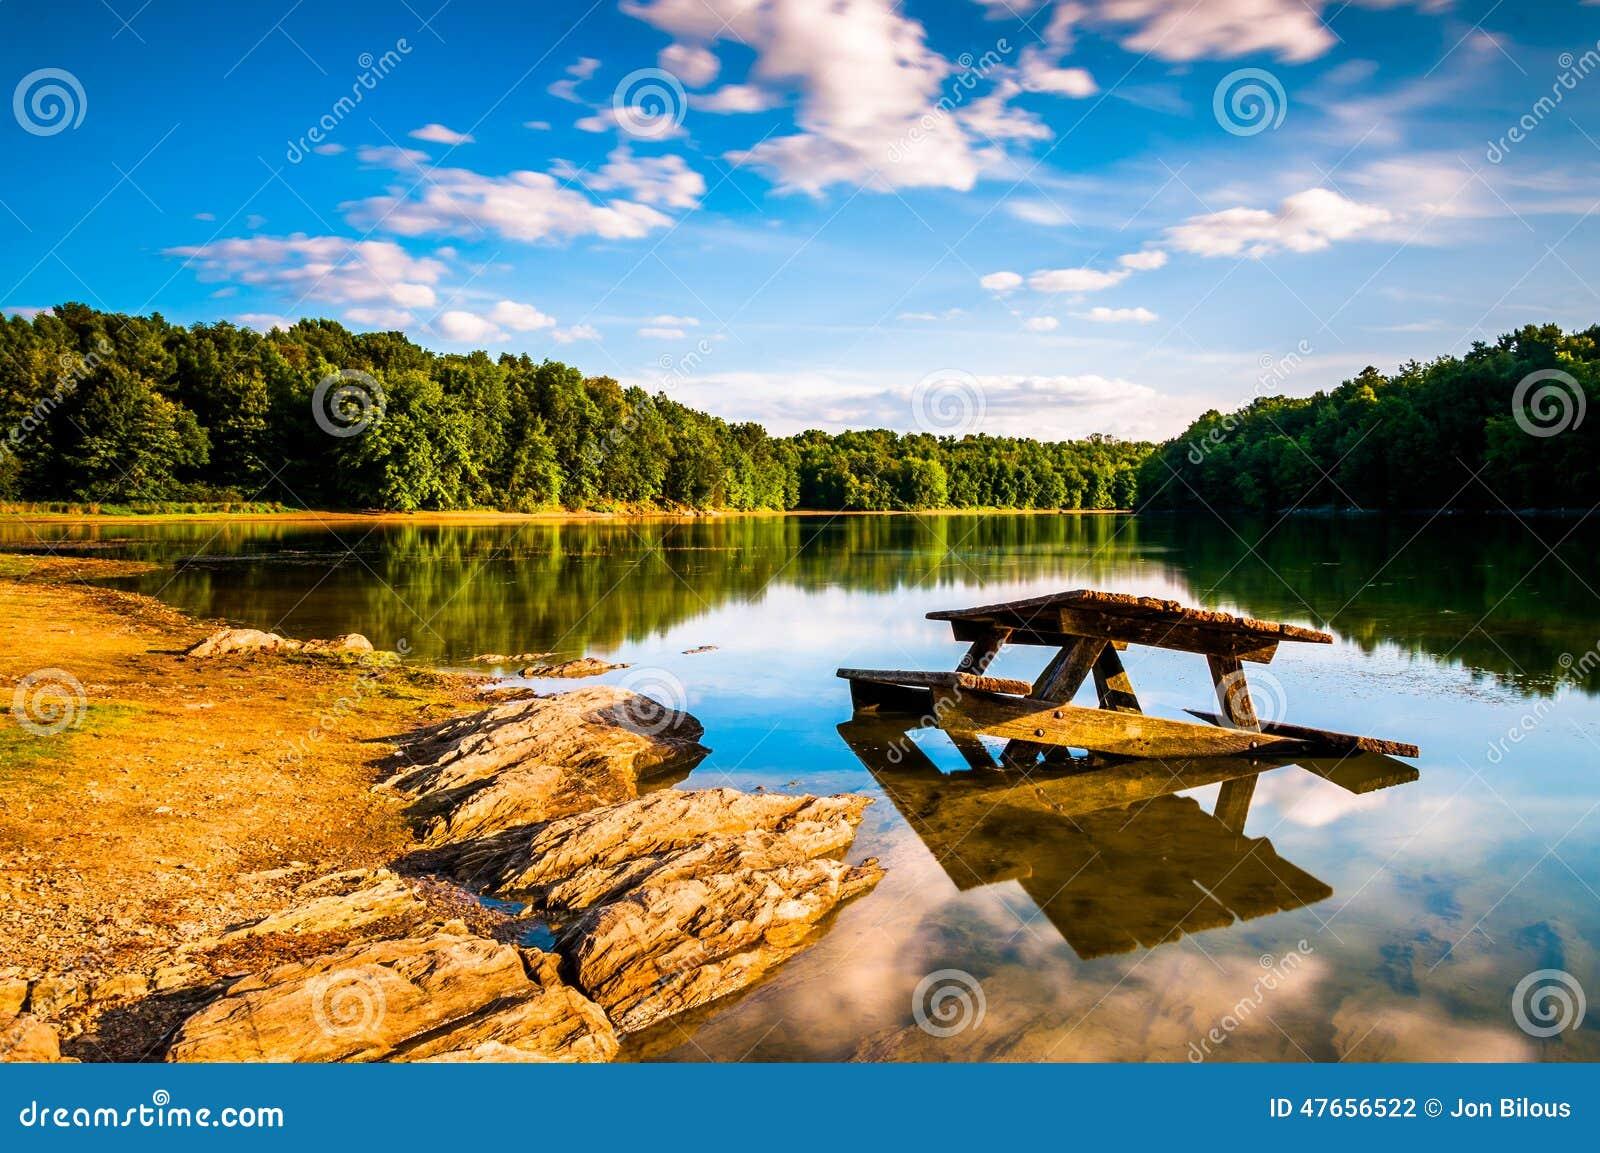 Rocks and a picnic table in Lake Marburg, at Codorus State Park, Pennsylvania.